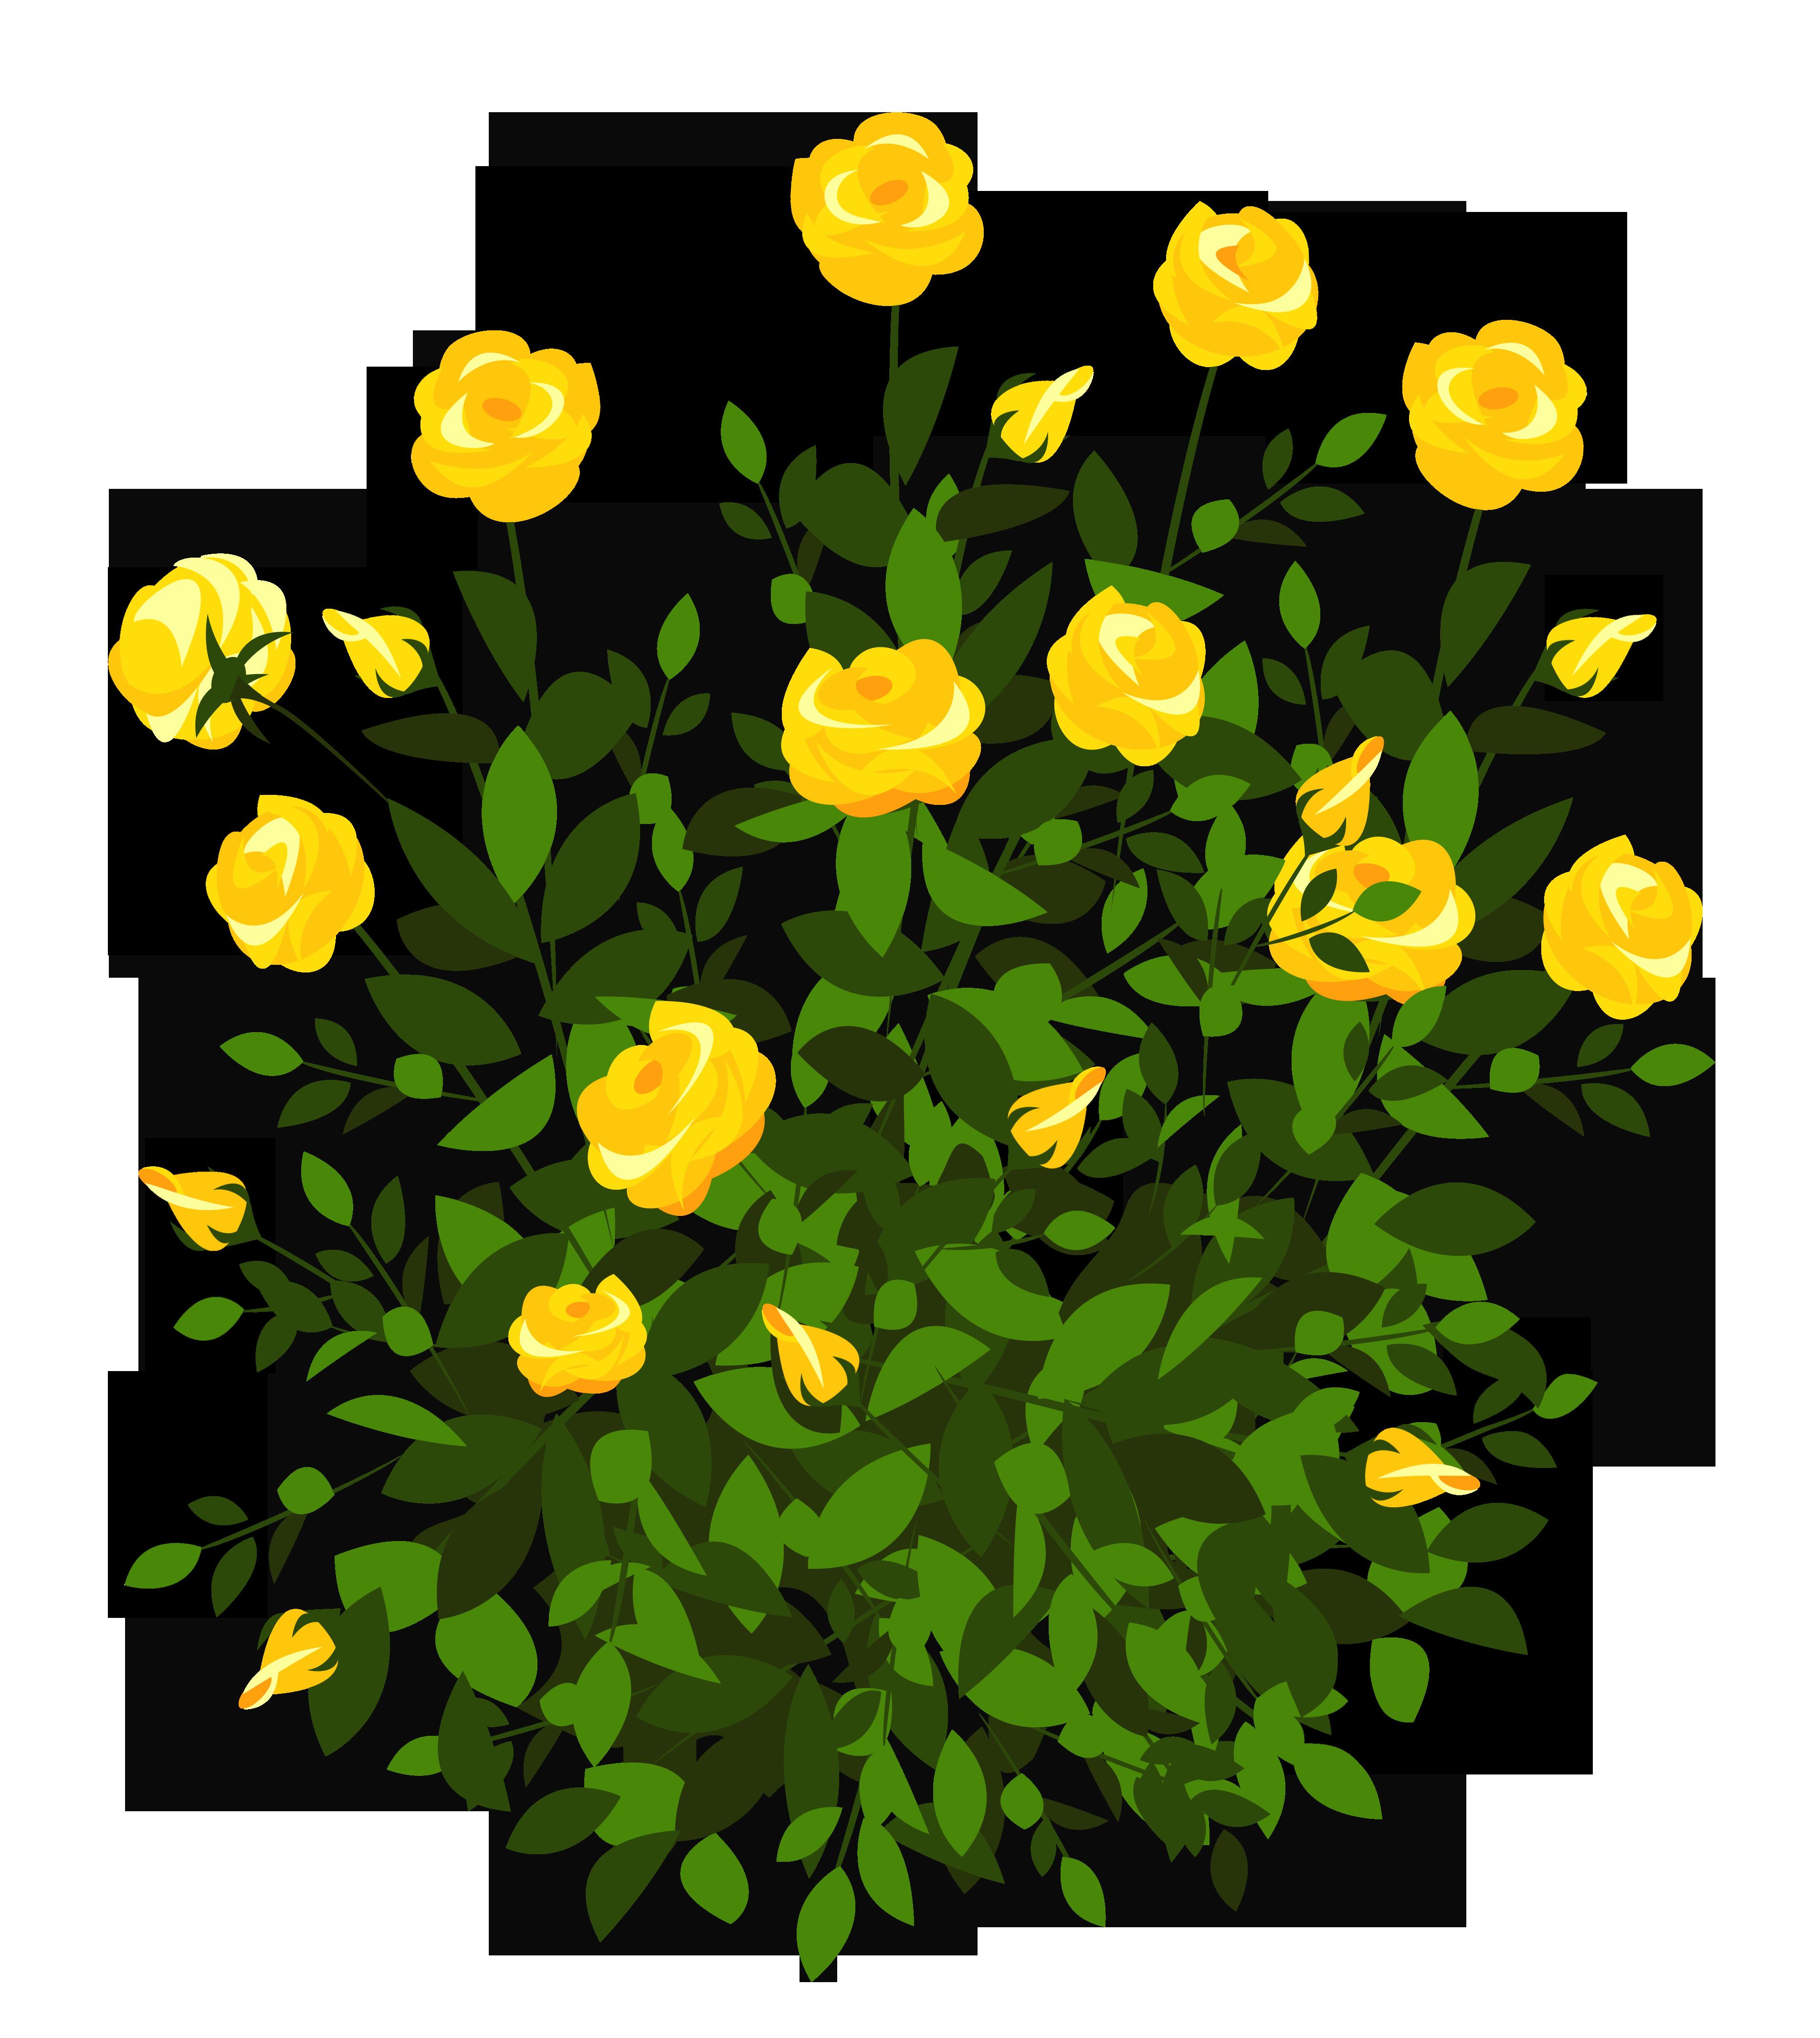 Rose clipart shrub. Flower clip art yellow